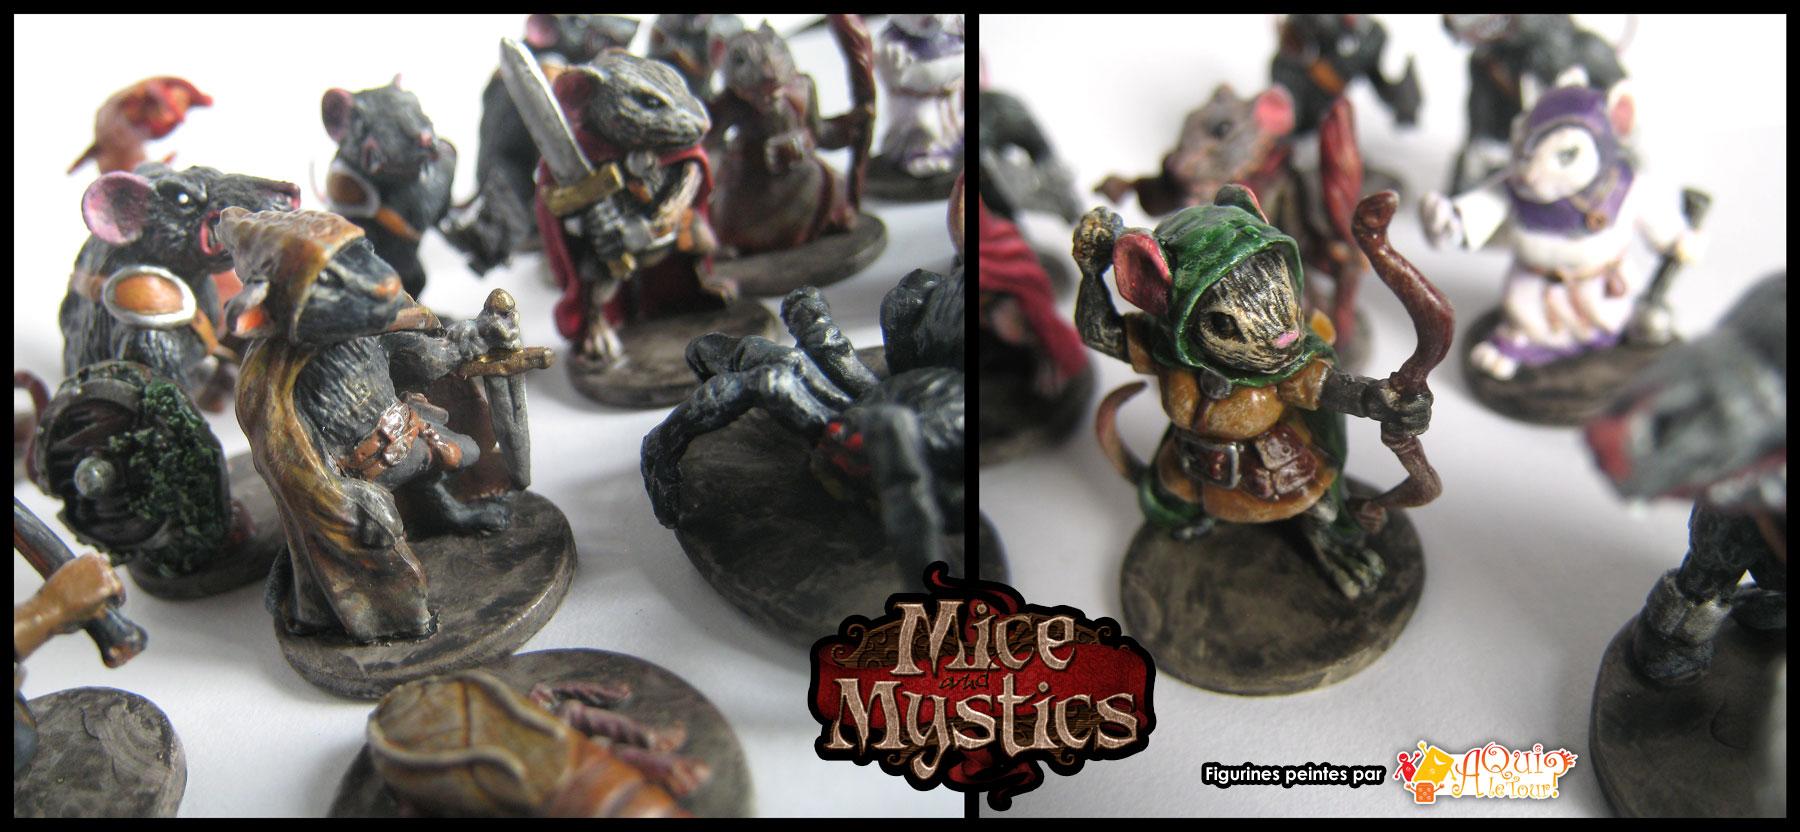 Figurines peintes de Mice and Mystics